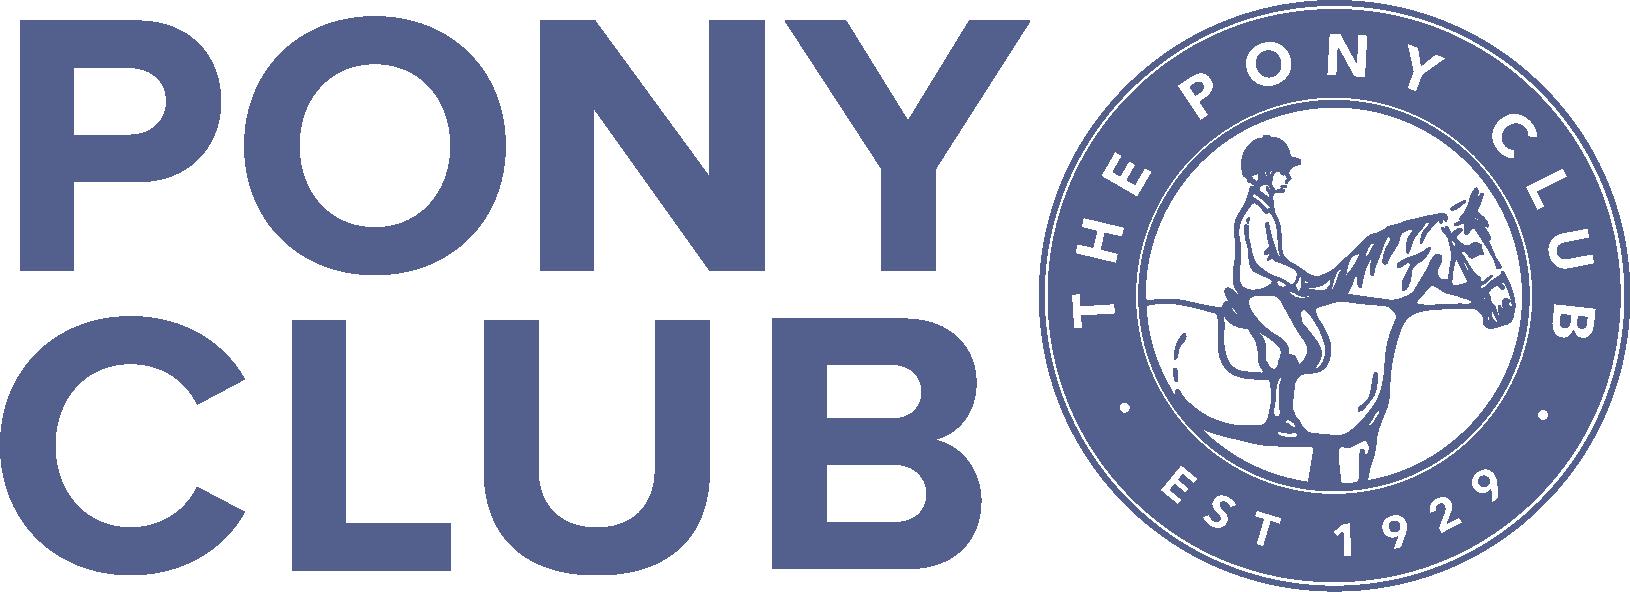 Horse club logos 2-01.png